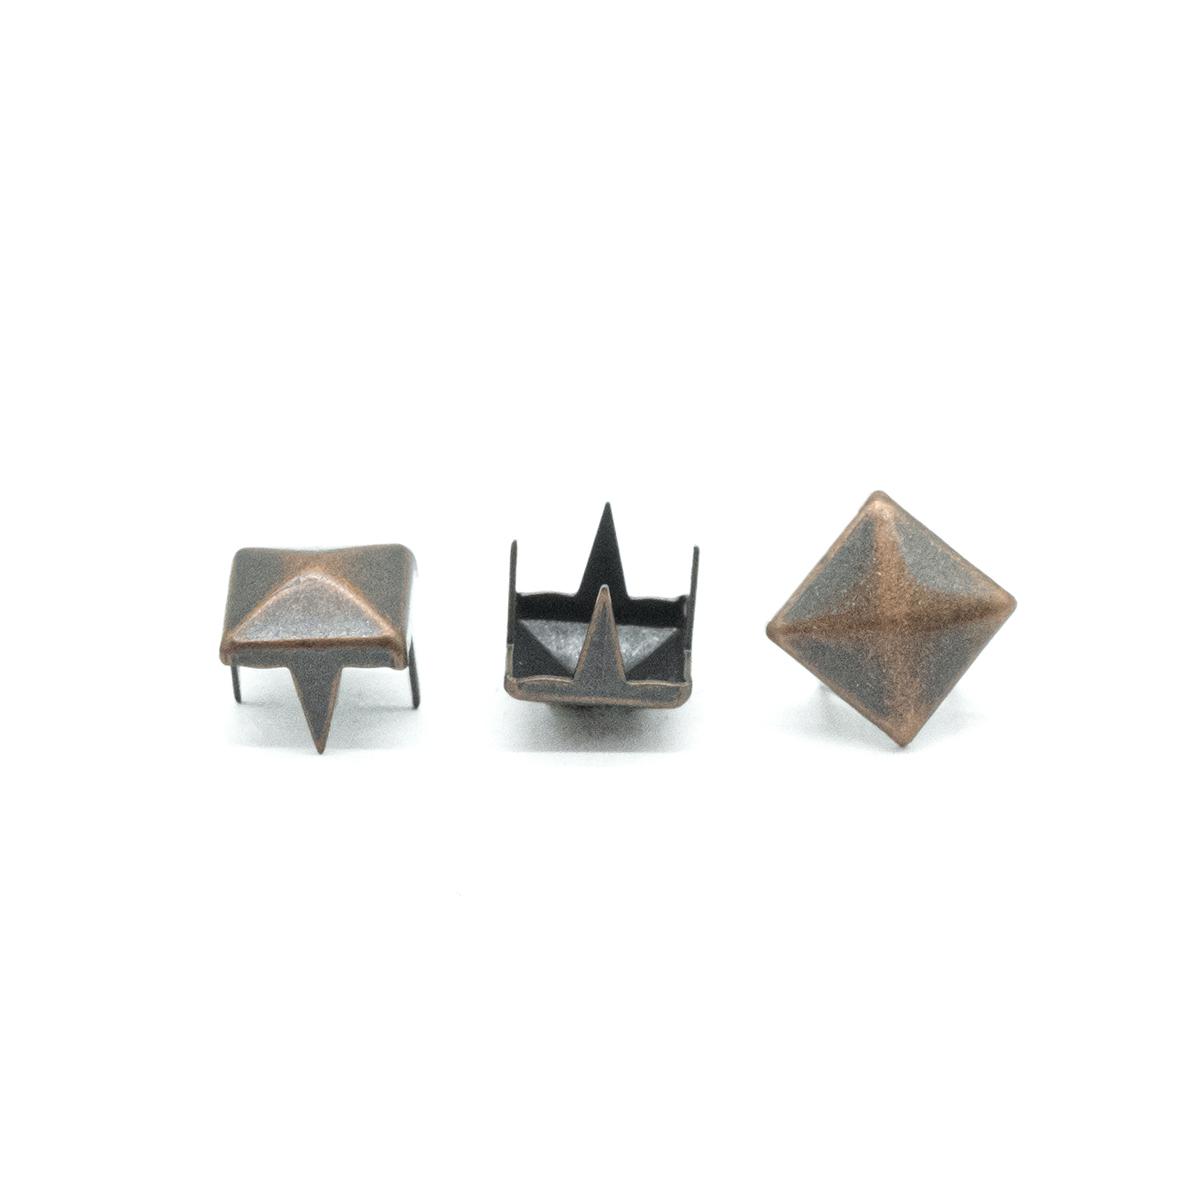 53925 Украшение 6*6мм на шипах т.медь. 'пирамидка' ГР